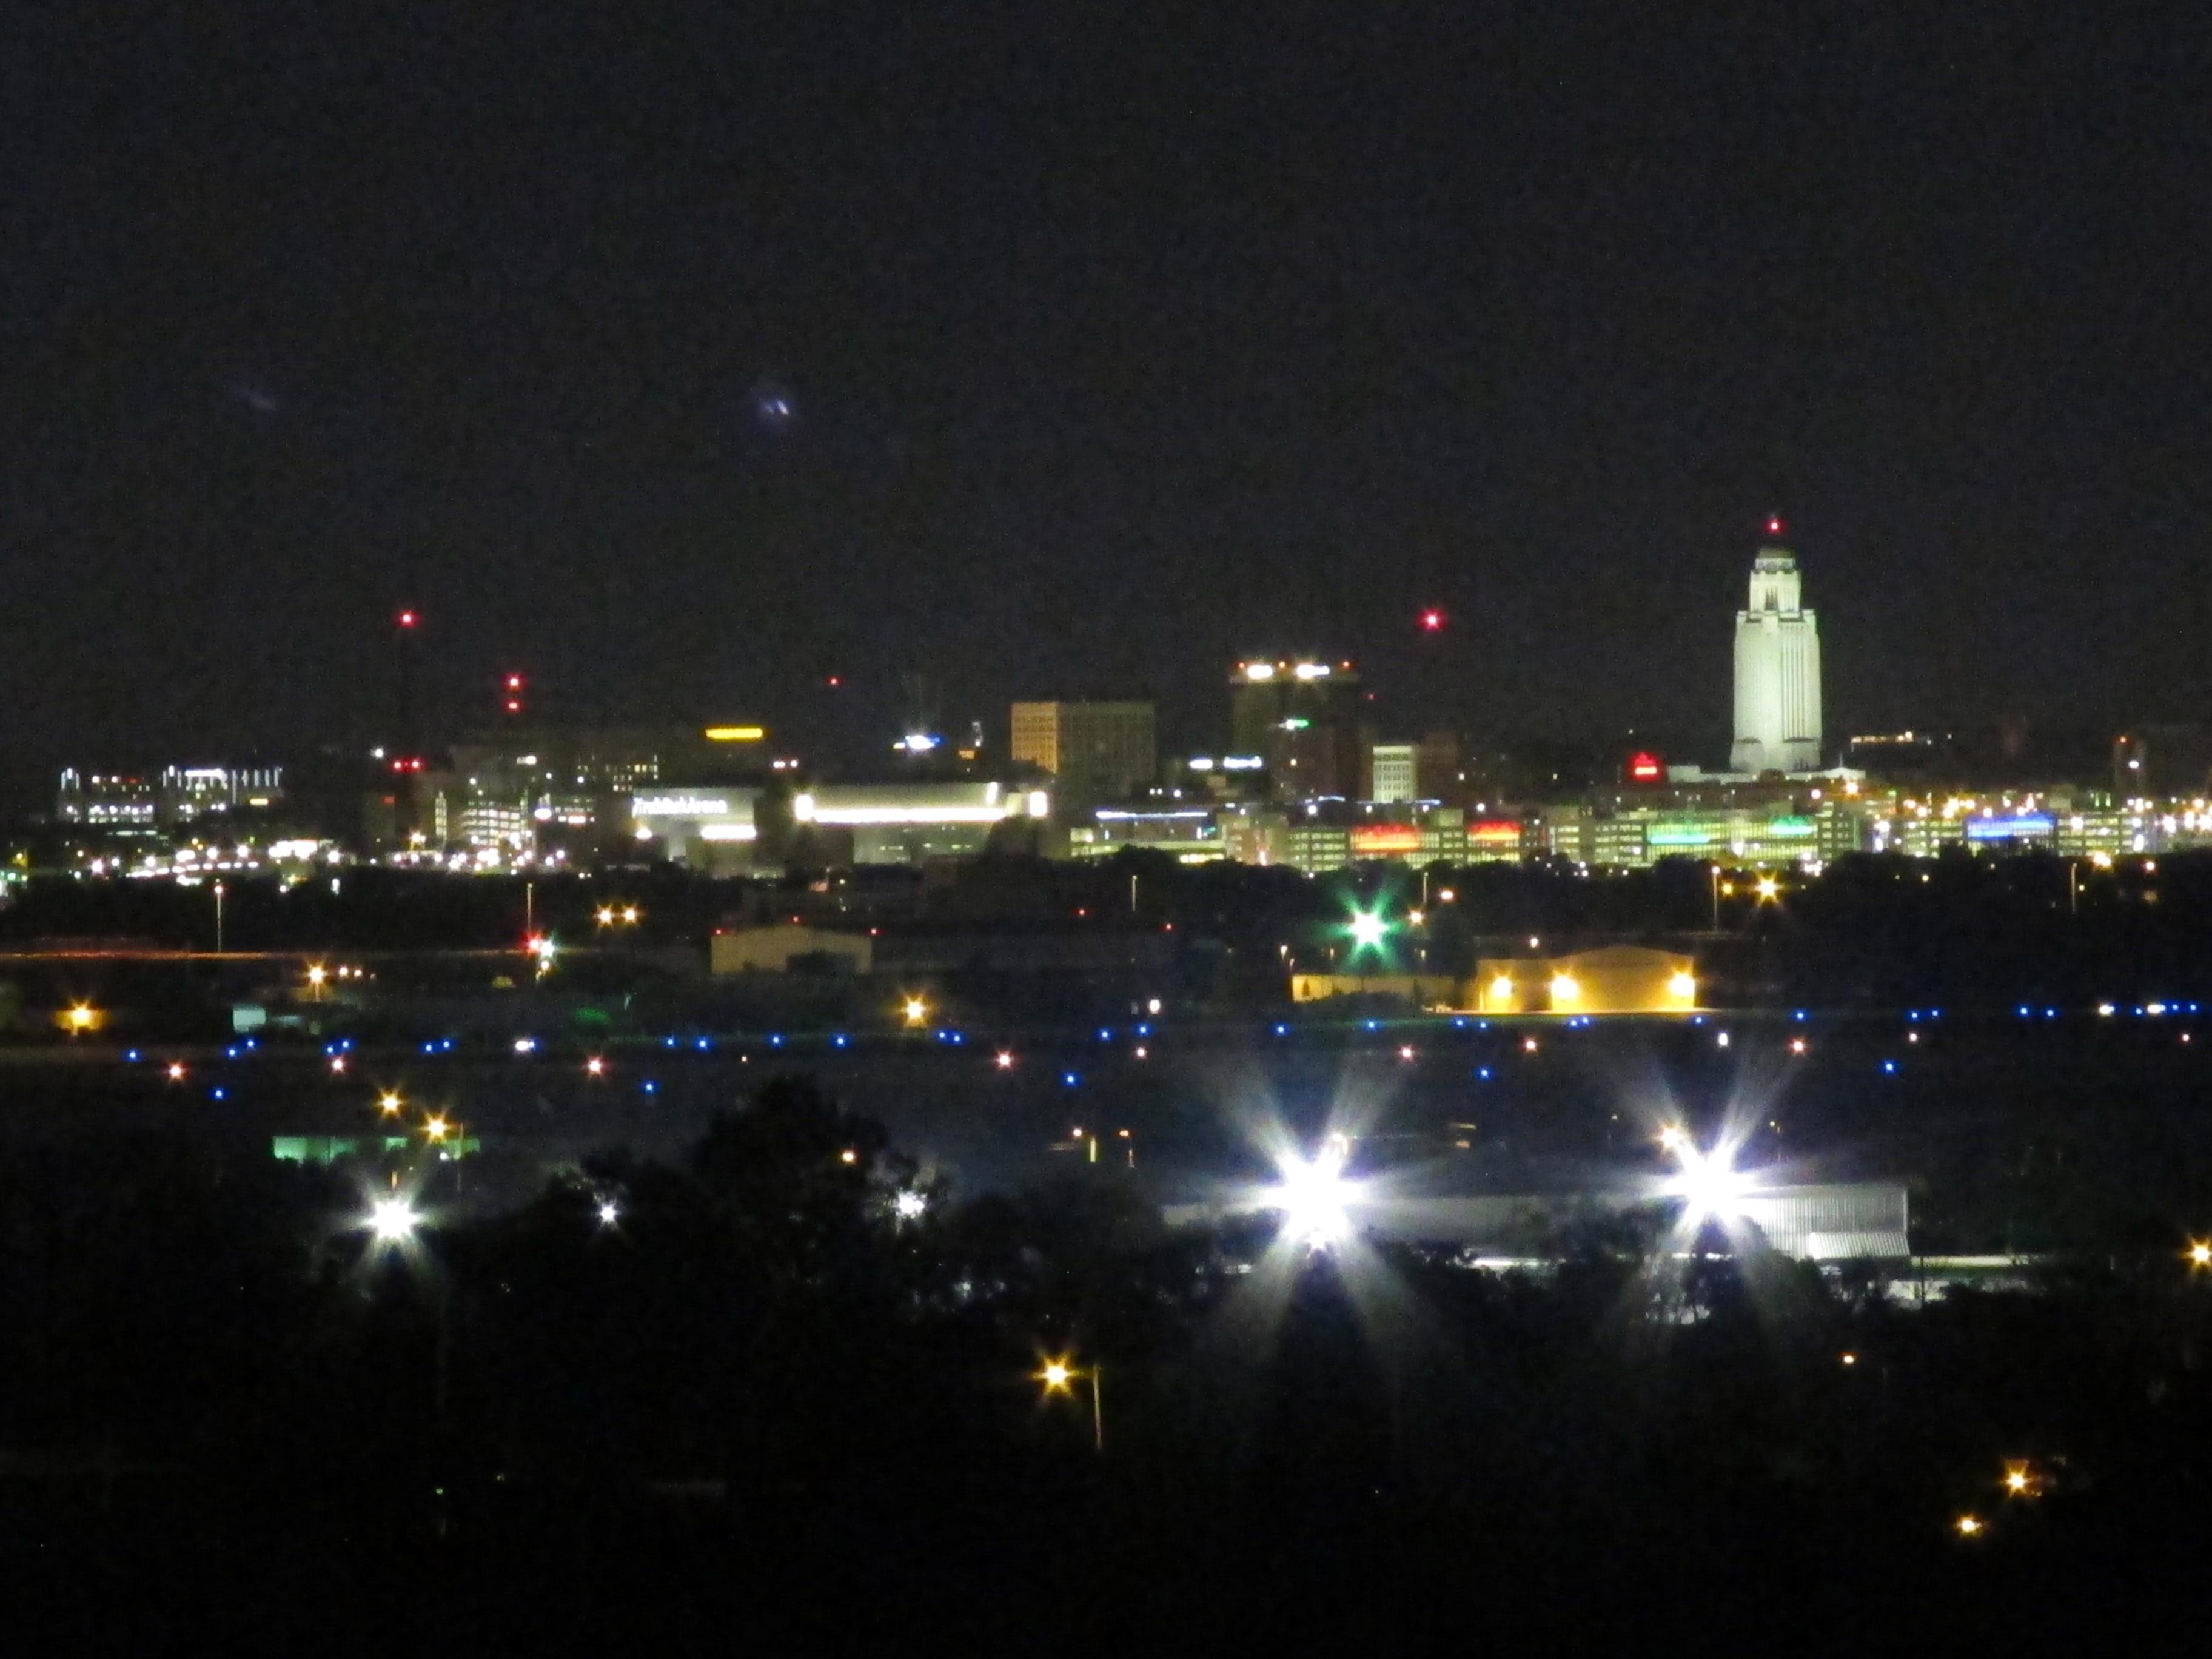 File Nighttime Skyline Of Downtown Lincoln Nebraska Usa